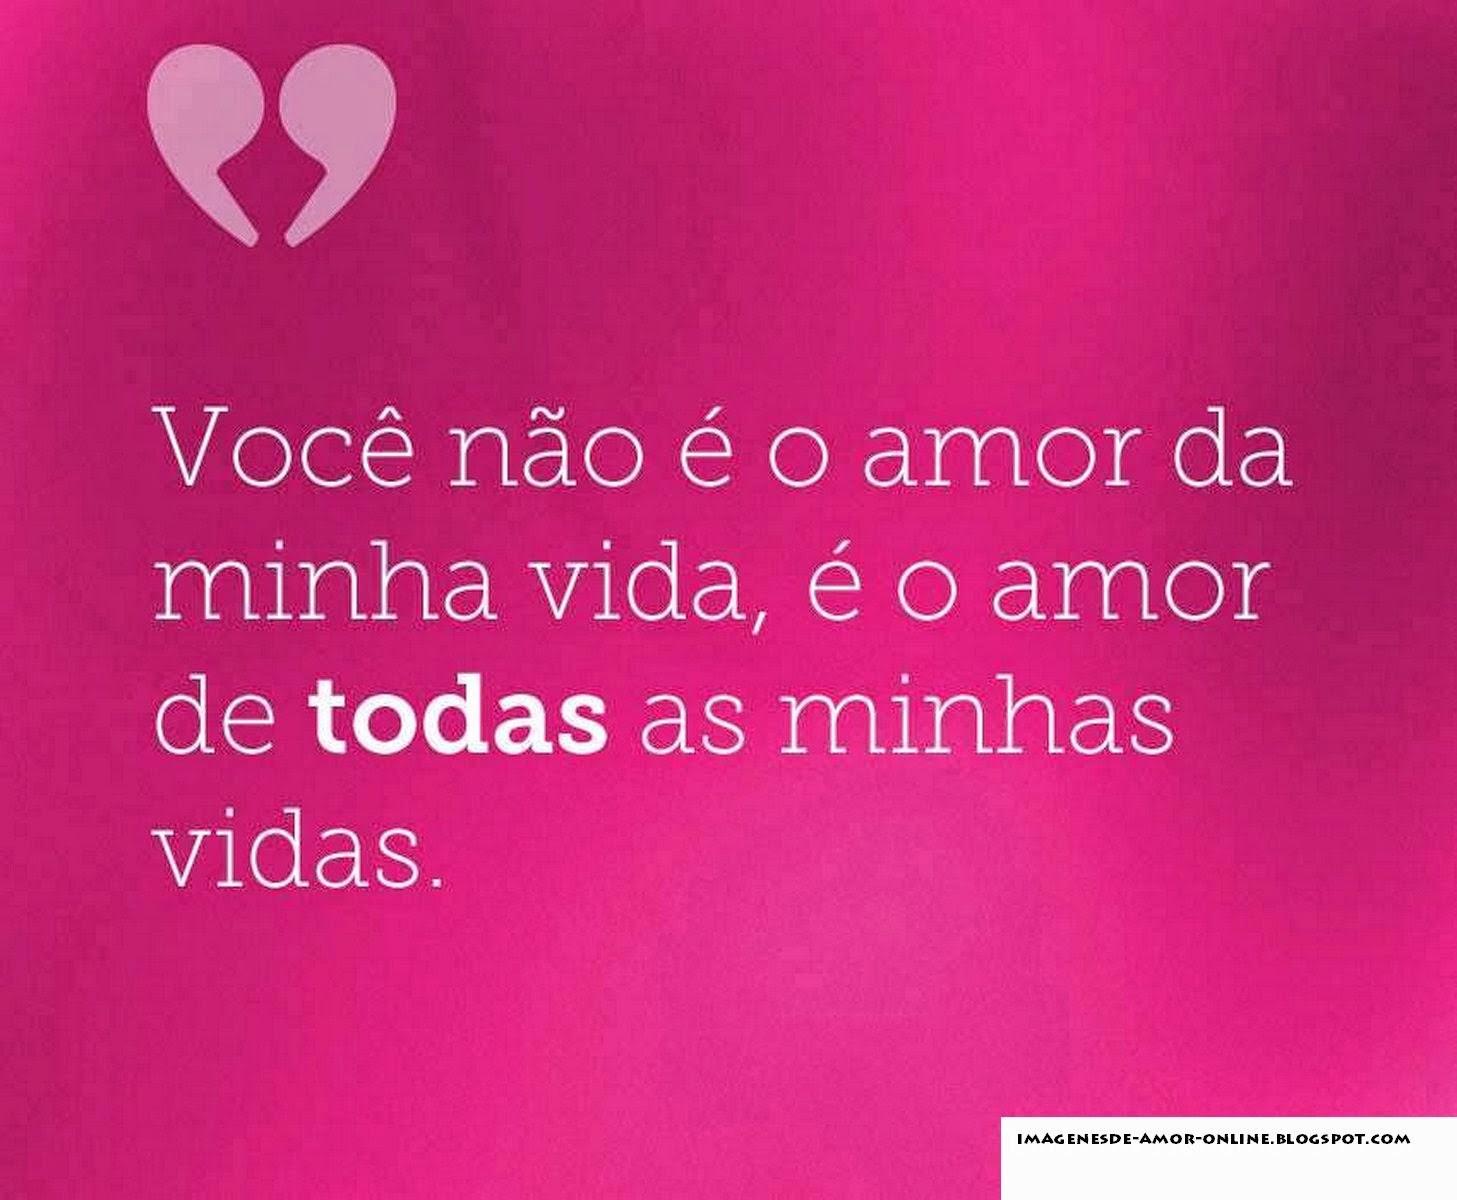 Imagenes Con Frases En Portugues Las 25 mejores ideas sobre Frases bonitas em portugues